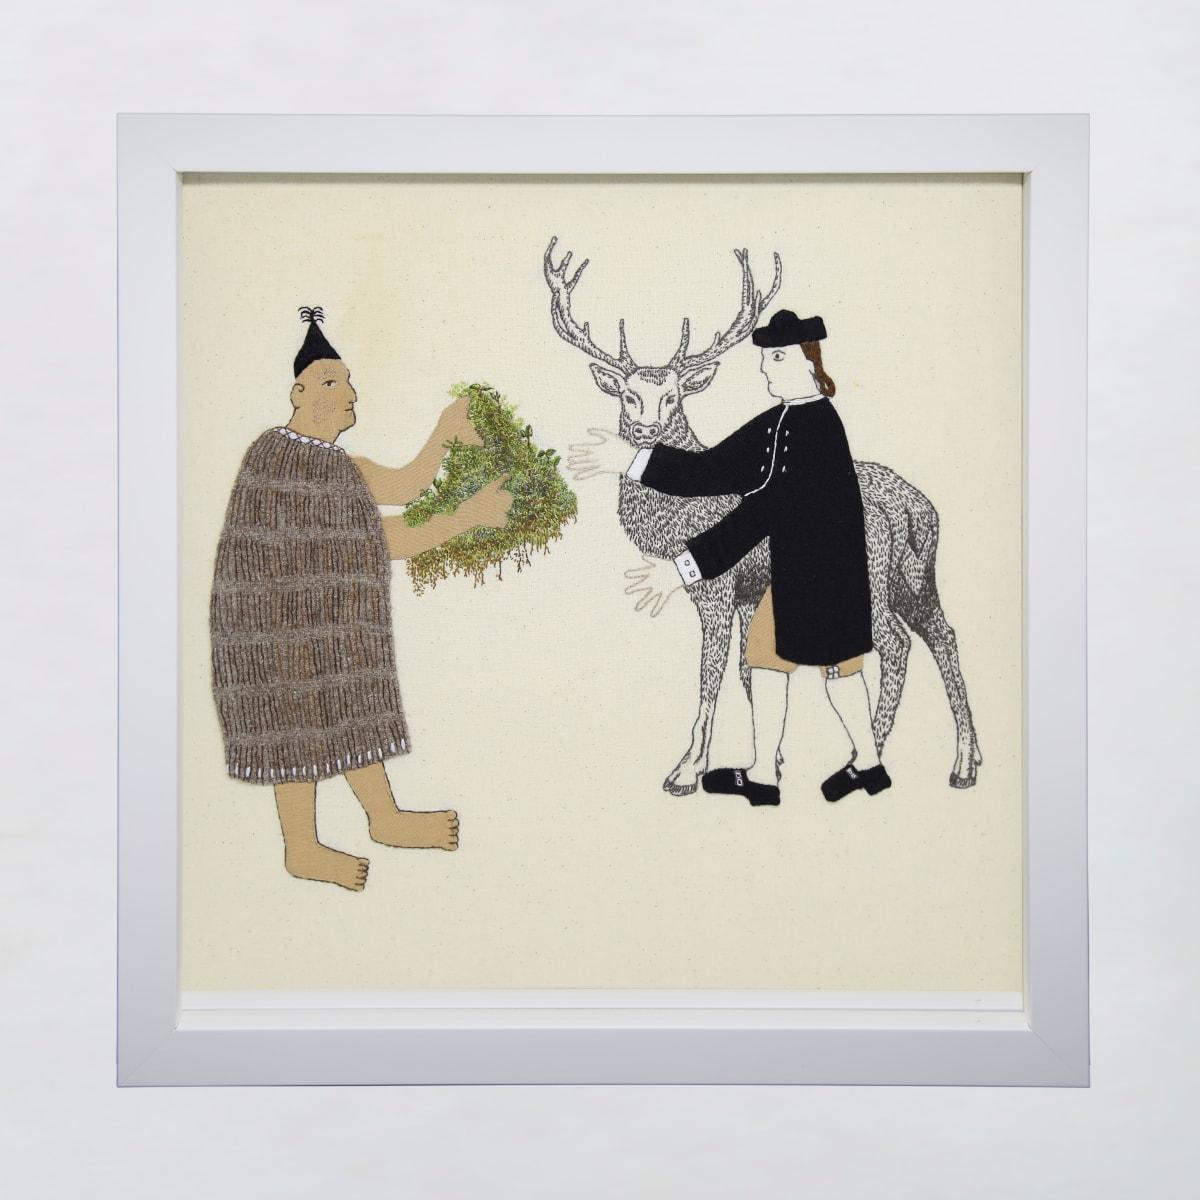 Sarah Munro, Trade Items - Moss, Filmy Ferns, Deer, 2019